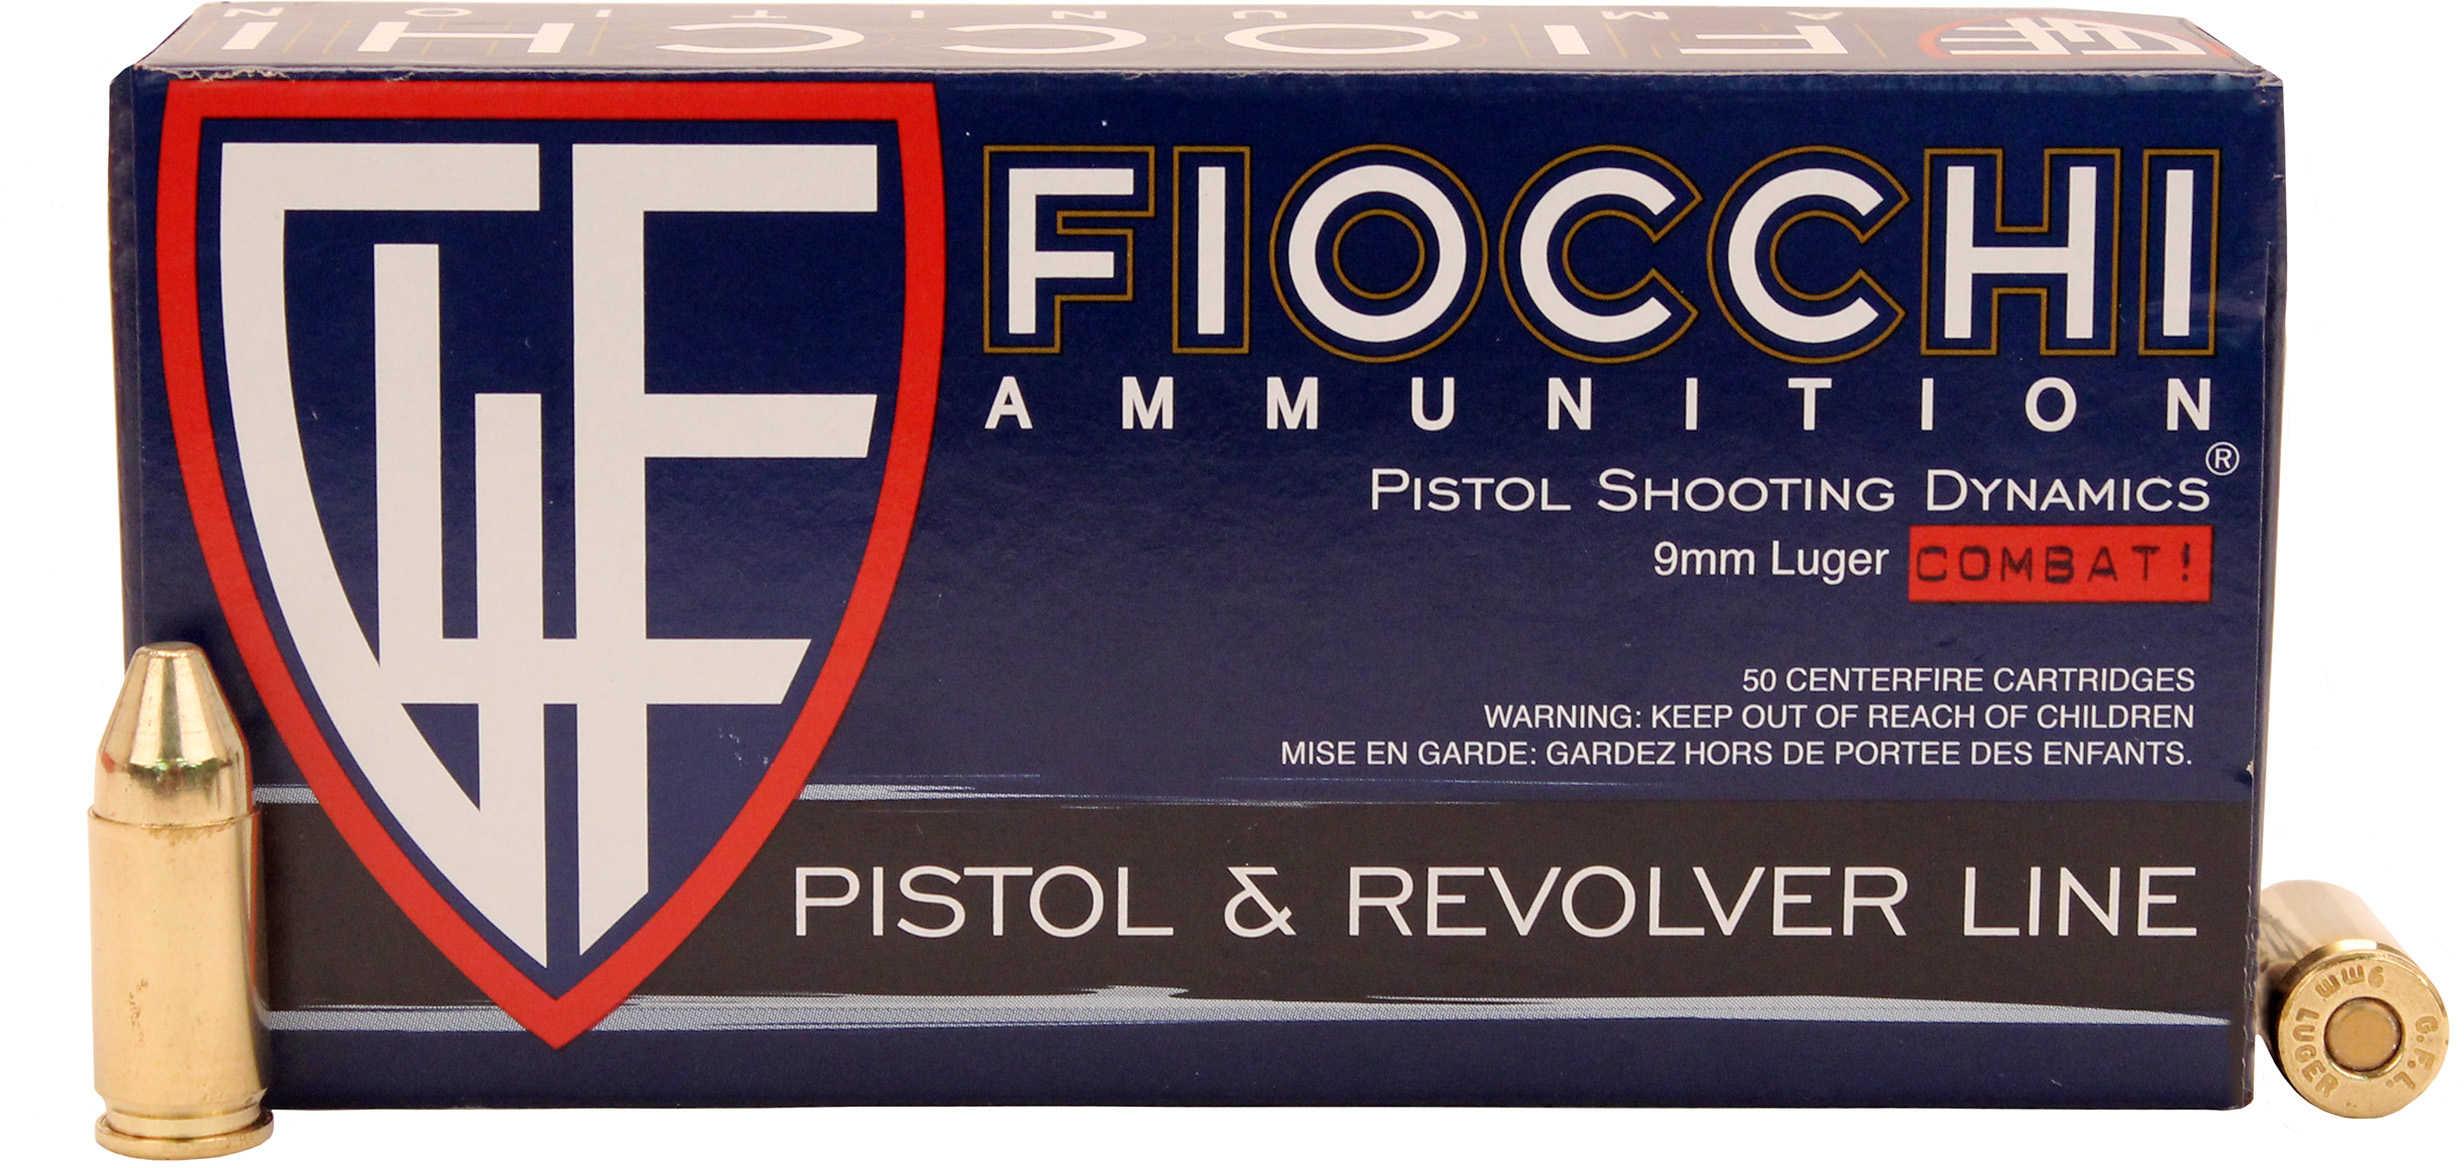 Fiocchi 9MM Luger 123 Grain Truncated Cone Full Metal Jacket Ammunition Md: 9APC